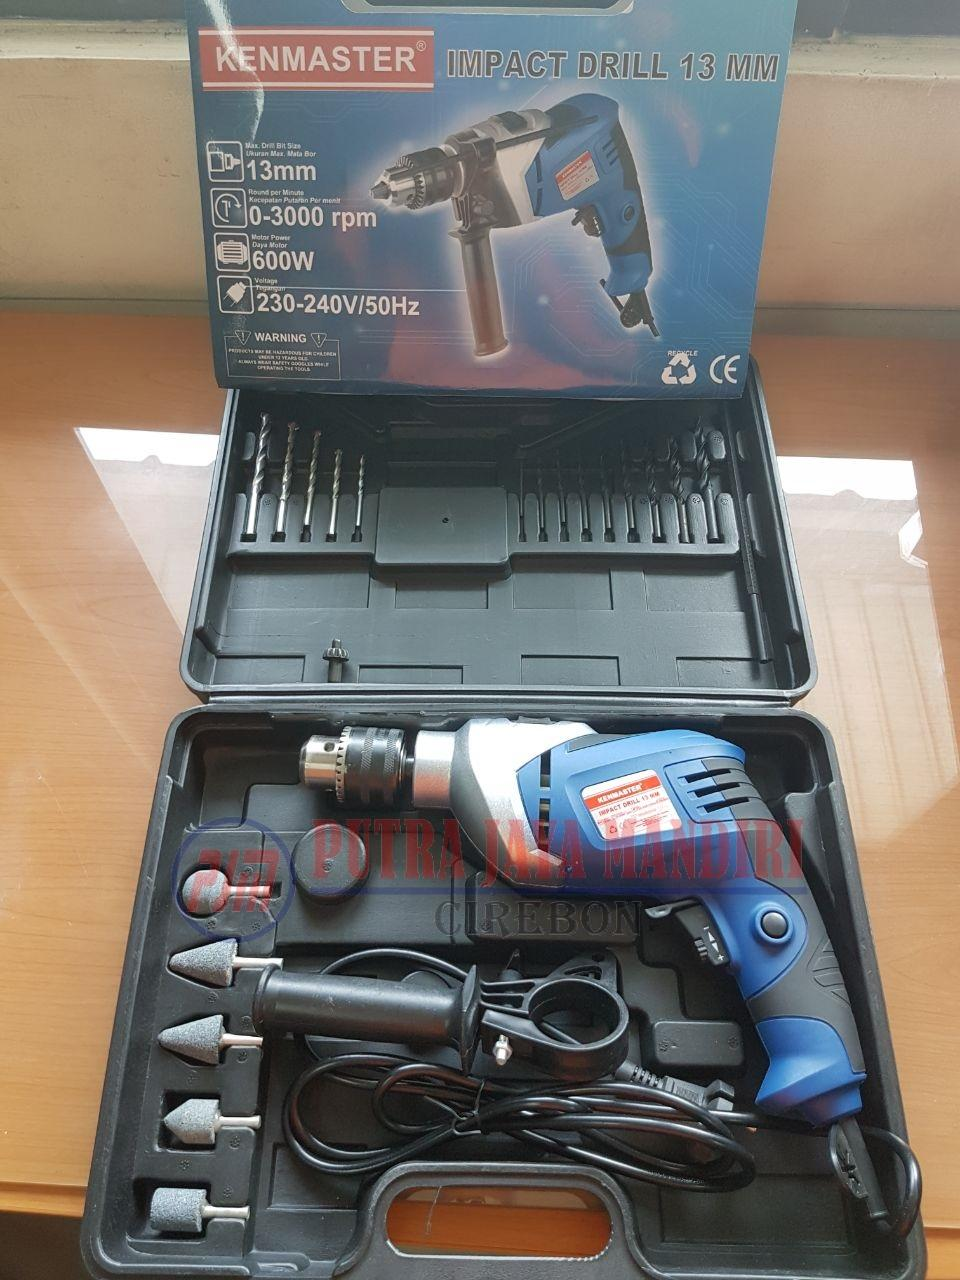 Run 13mm Power Impact Drill Mesin Bor Beton Daftar Harga Terbaik Dewalt Dc750ka Baterai Kenmaster Tembok Koper With Box